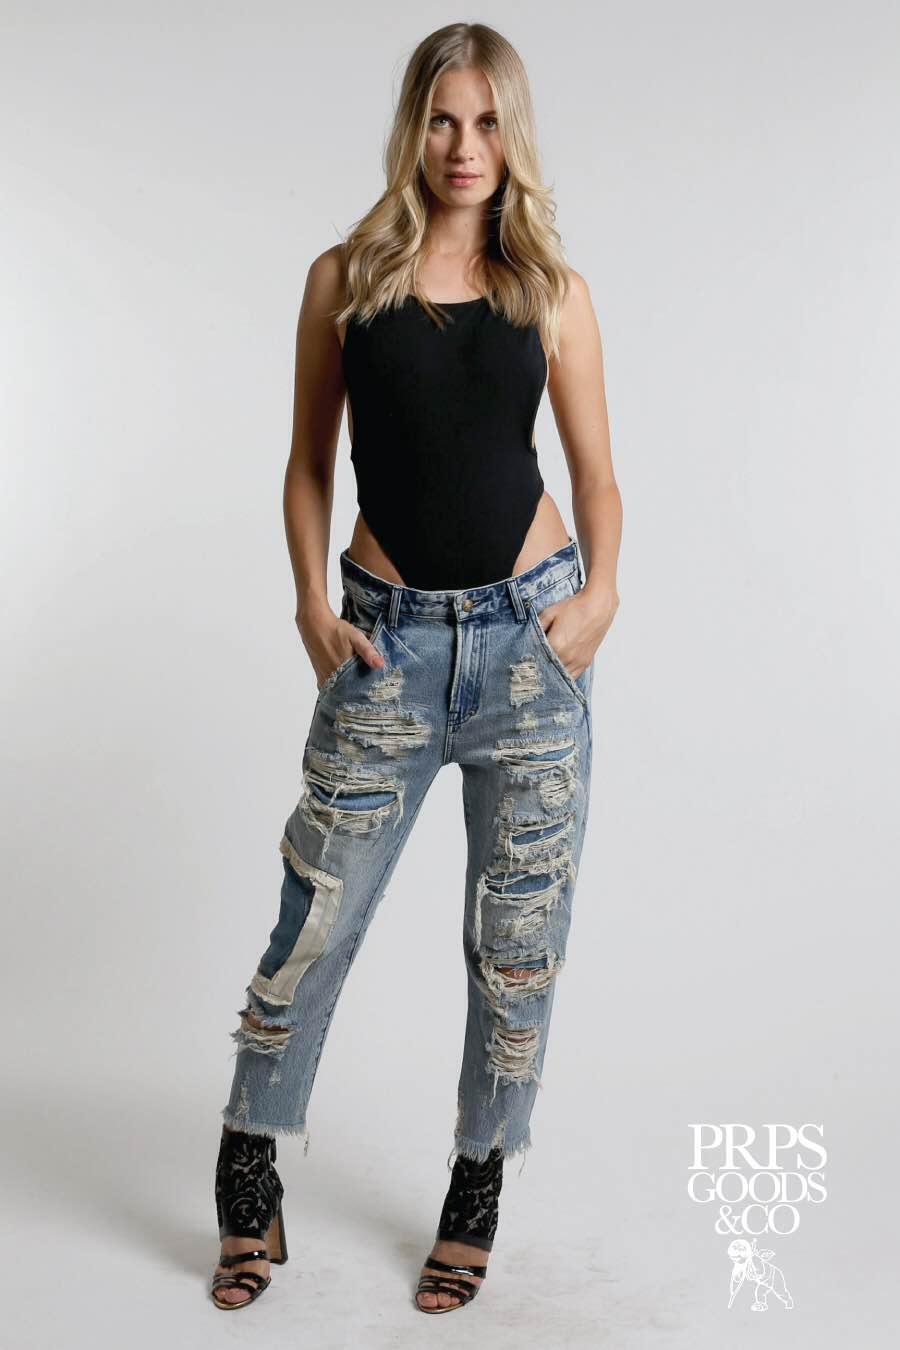 PRPS Womens Ladies Jeans Denim 2016 18